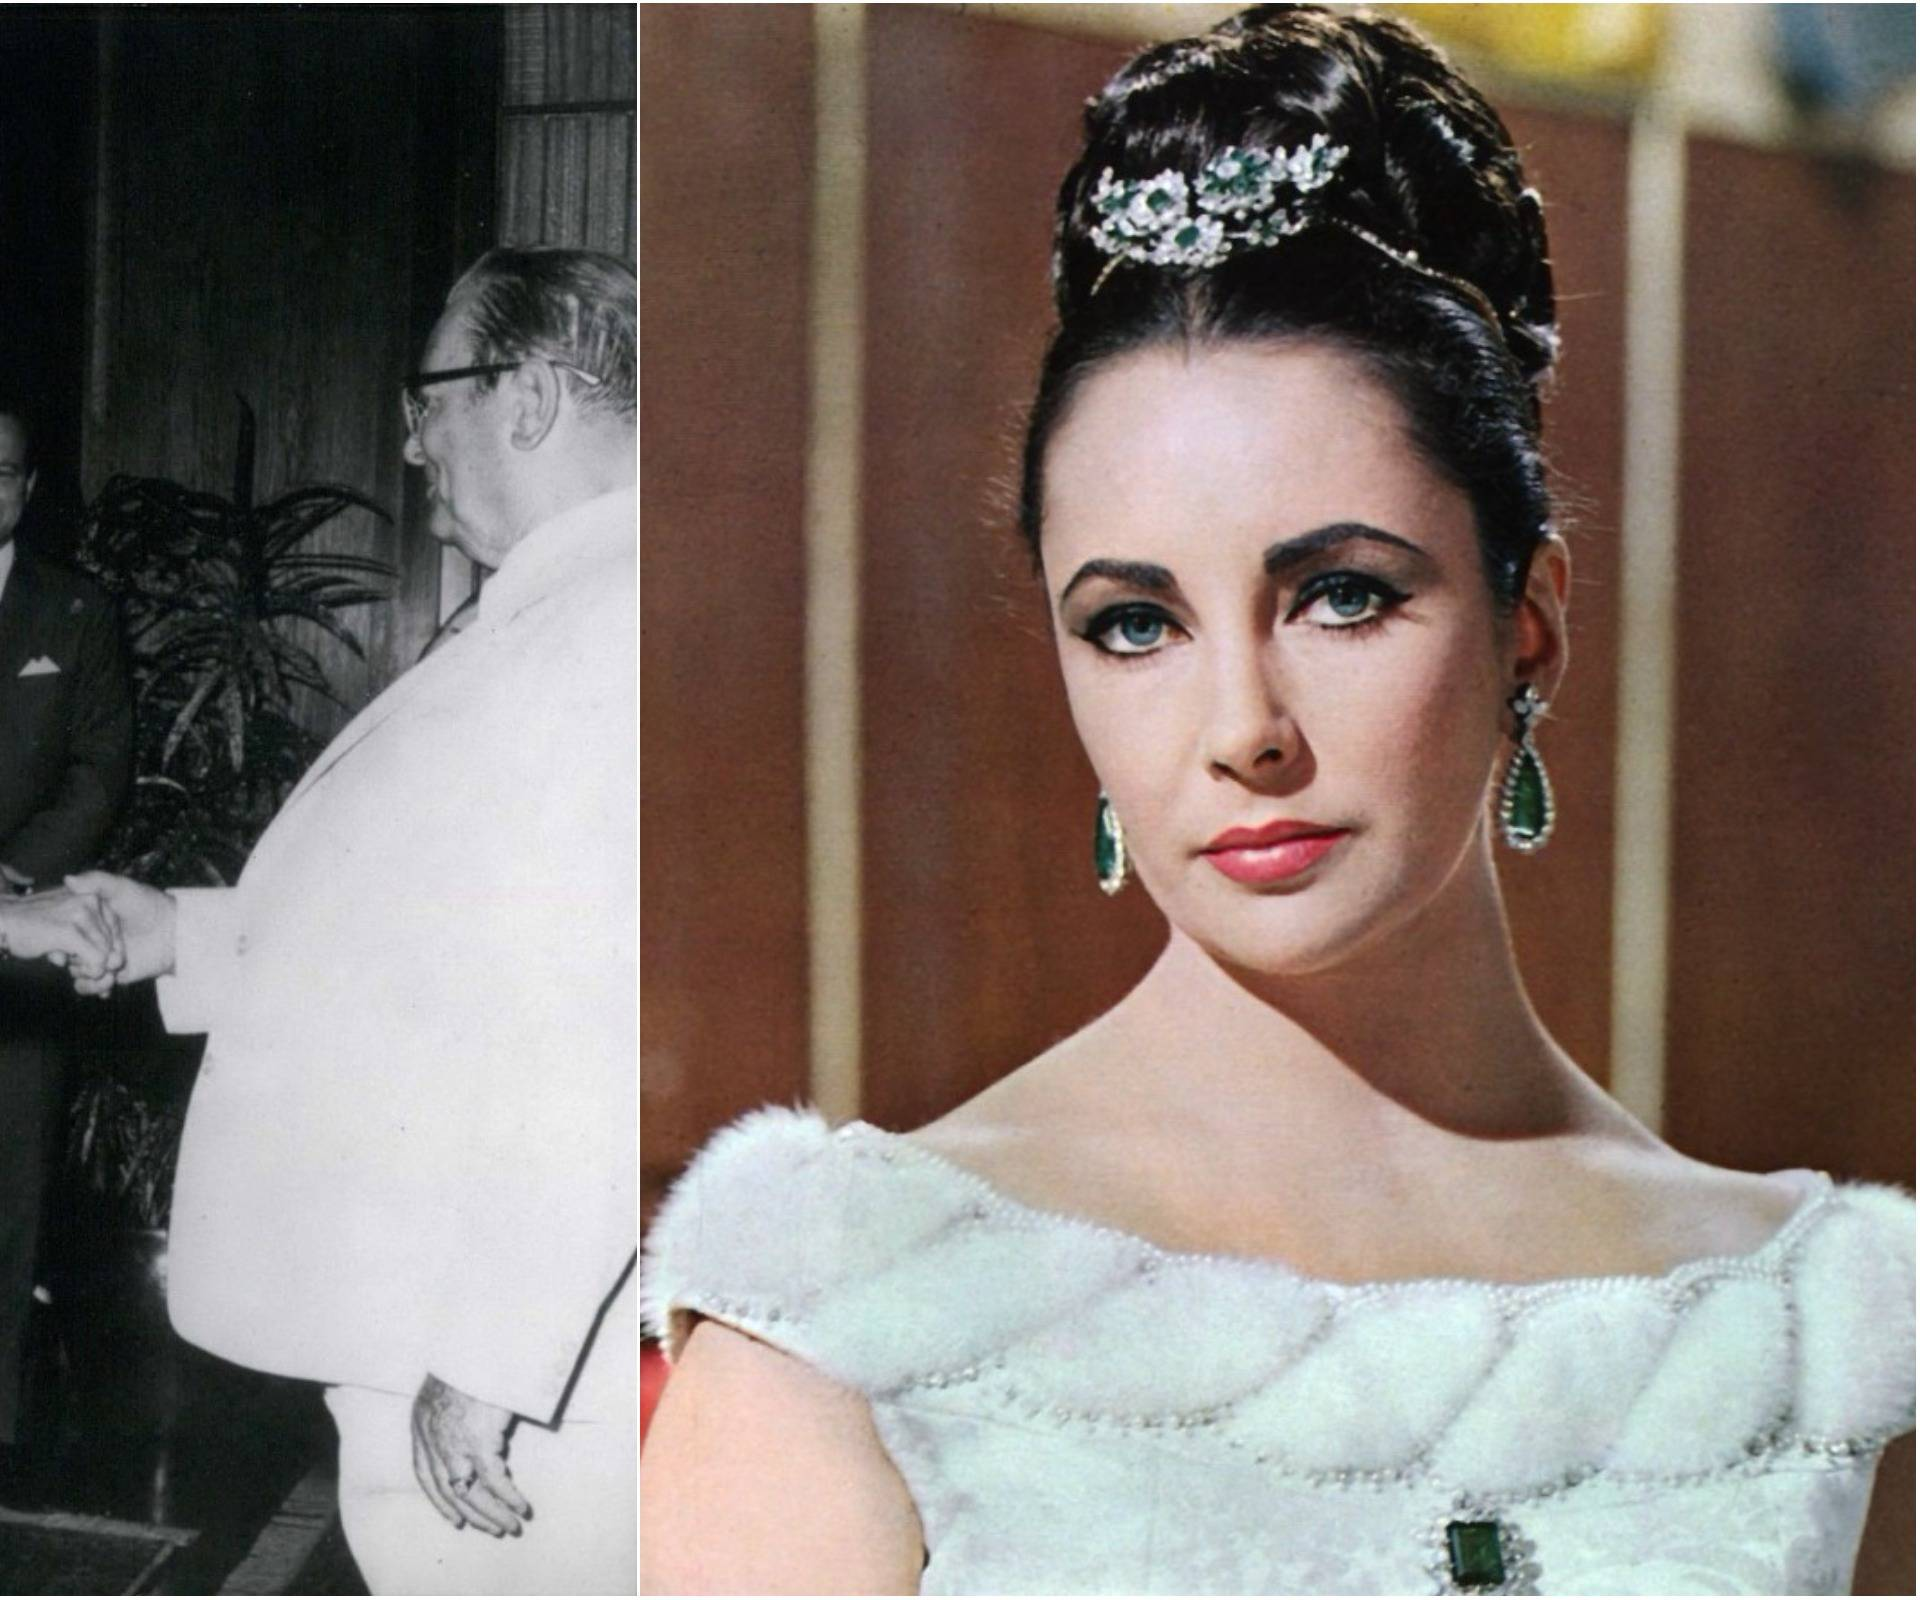 Strastveno je voljela dijamante i brak, a Tita je 'zaboravila'...